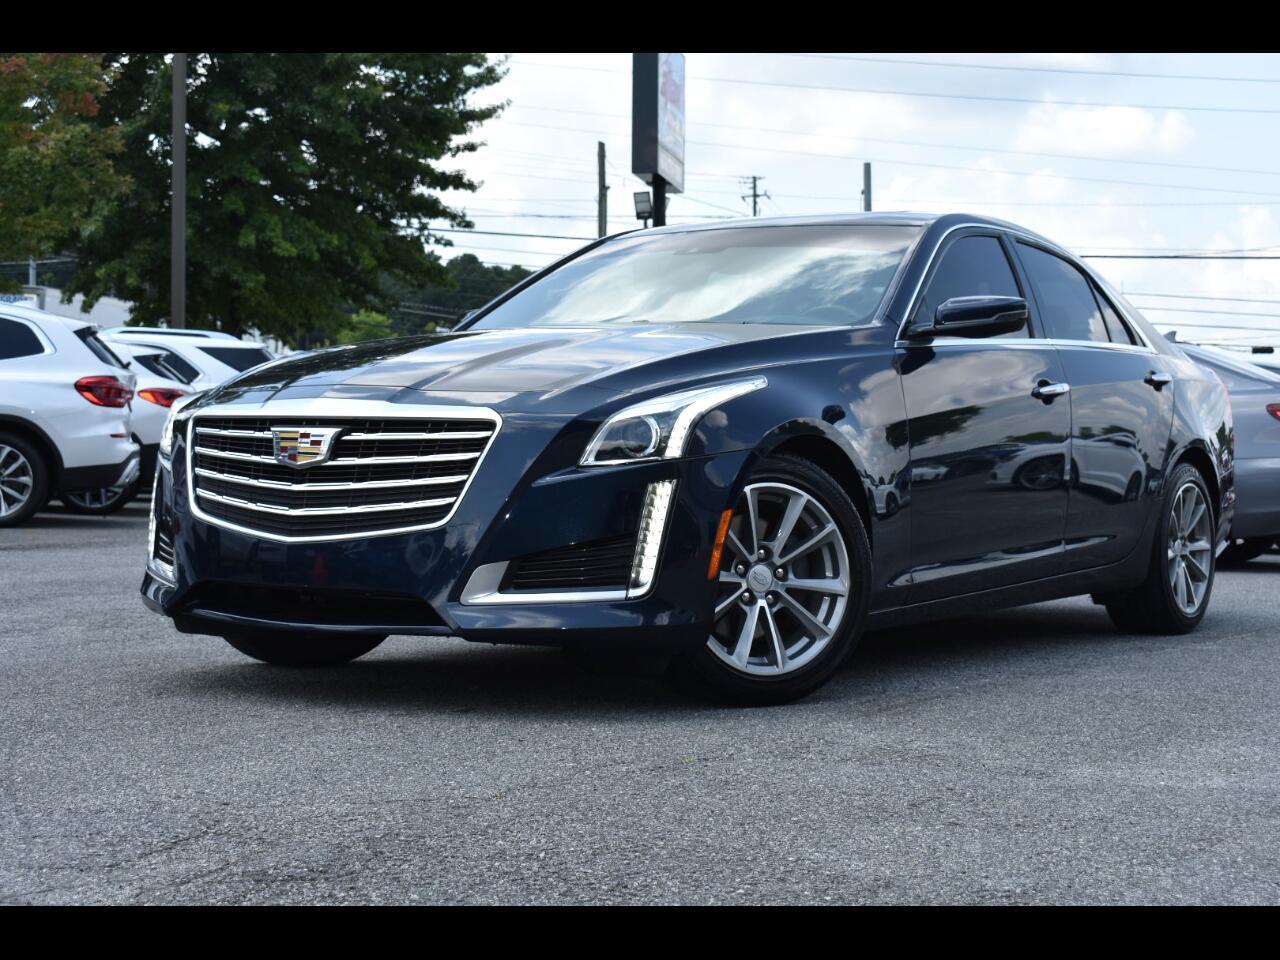 Cadillac CTS Luxury 4D Sedan RWD 2.0t 2017